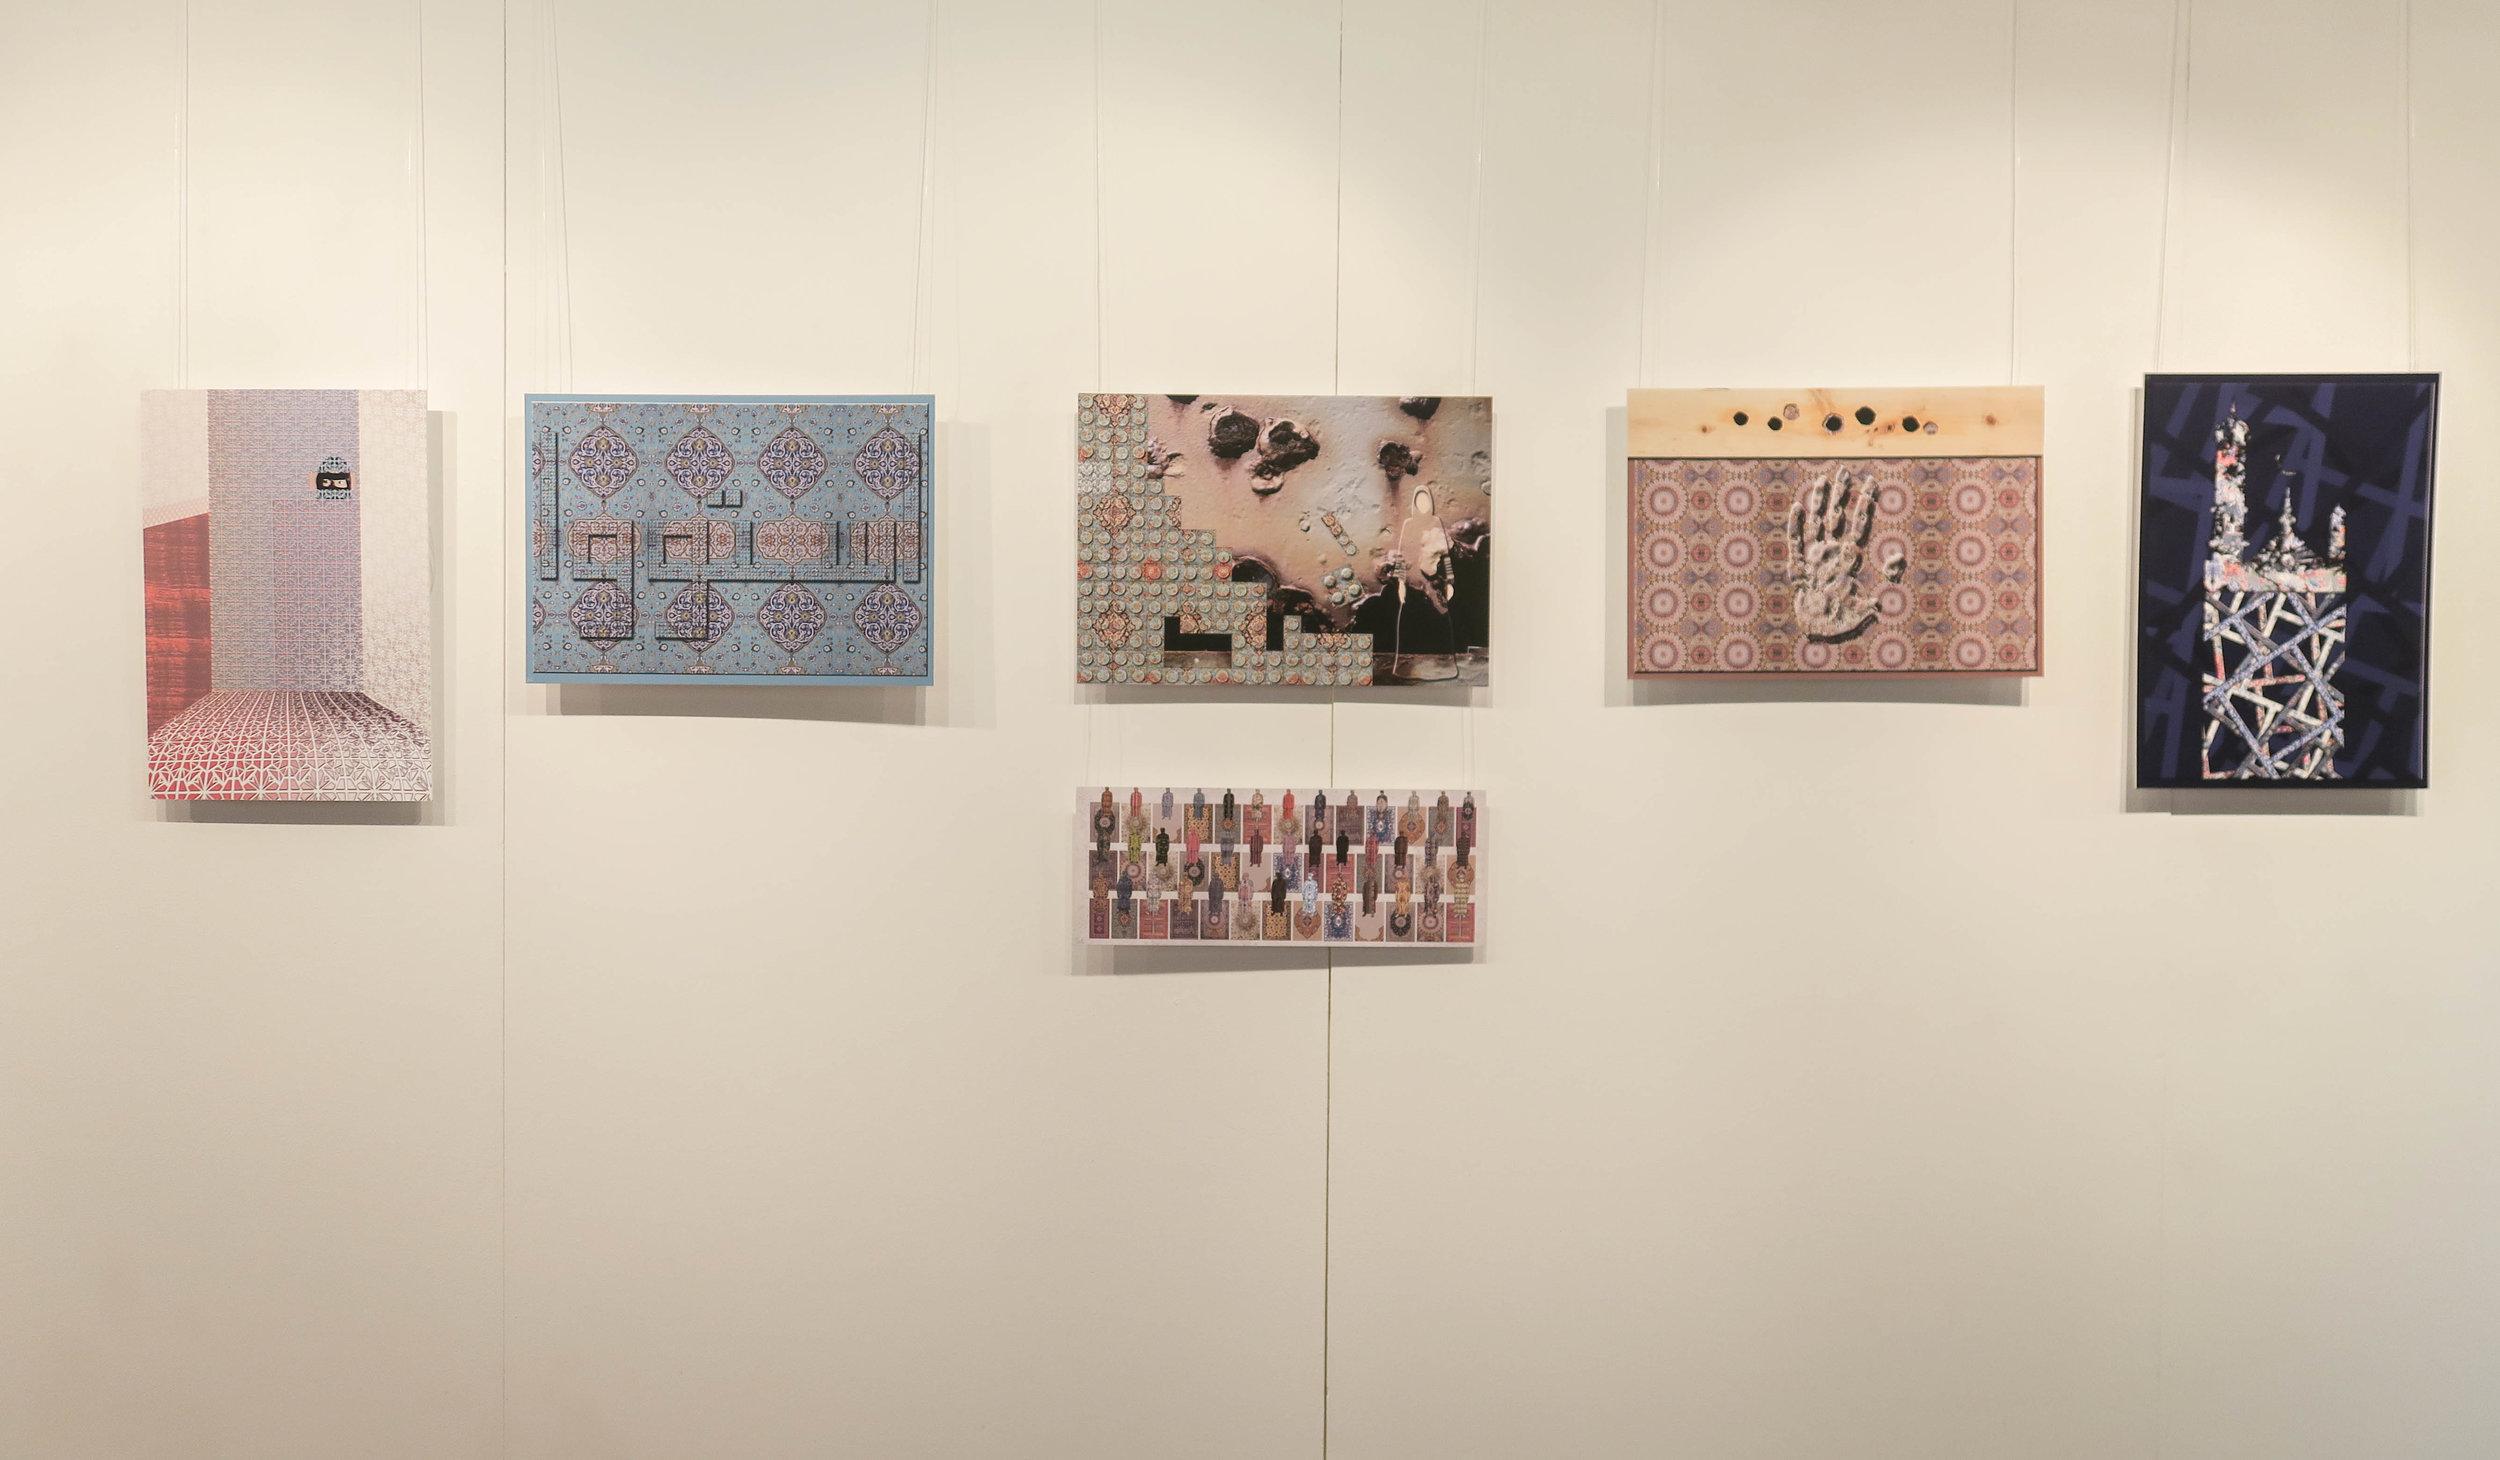 Islamic Art and Graphic Design